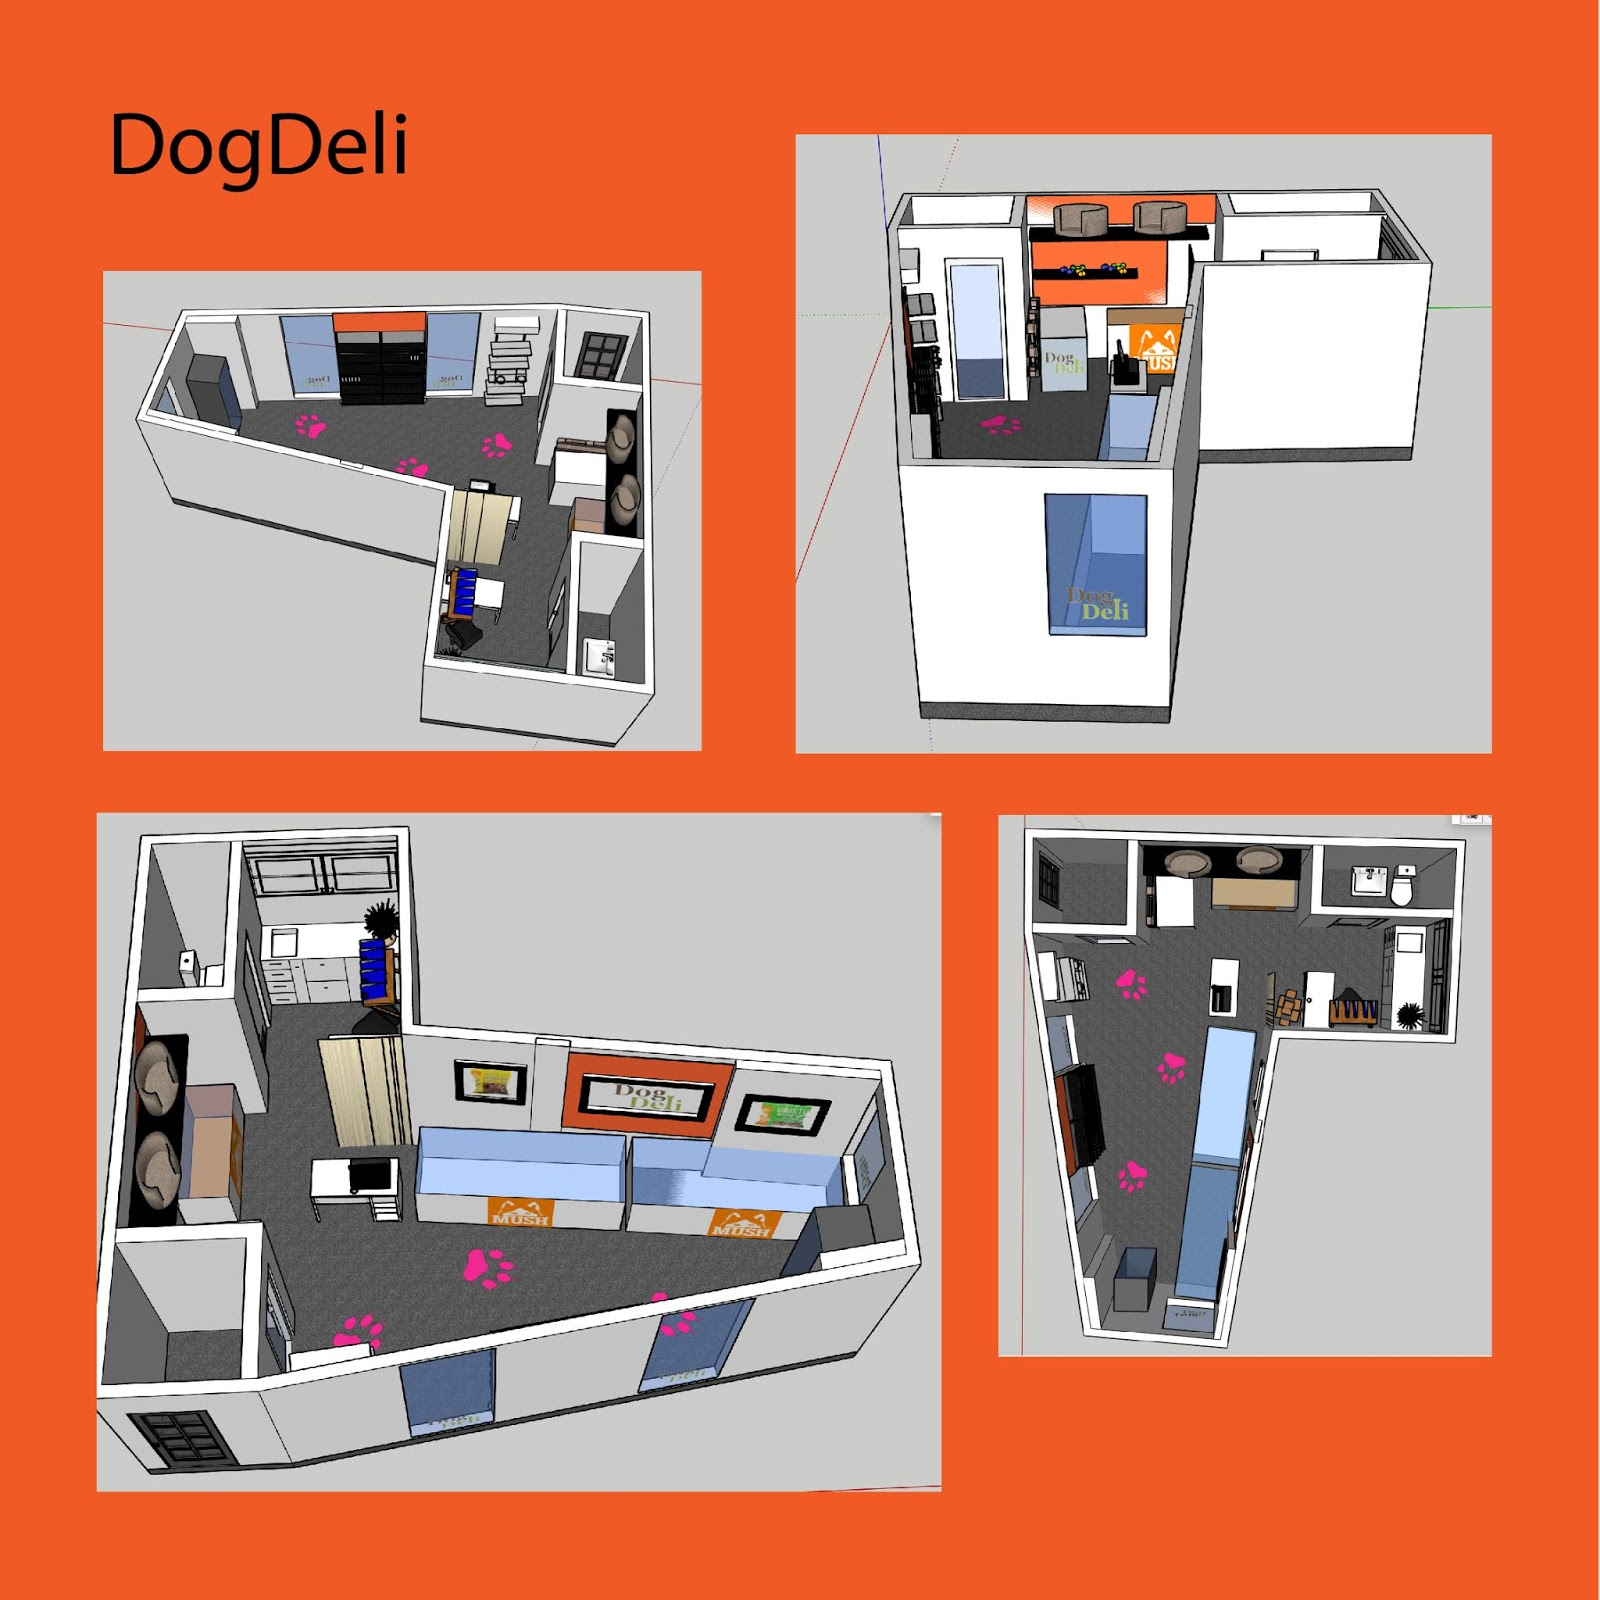 DogDeli_3d_kuvat_myymalatila